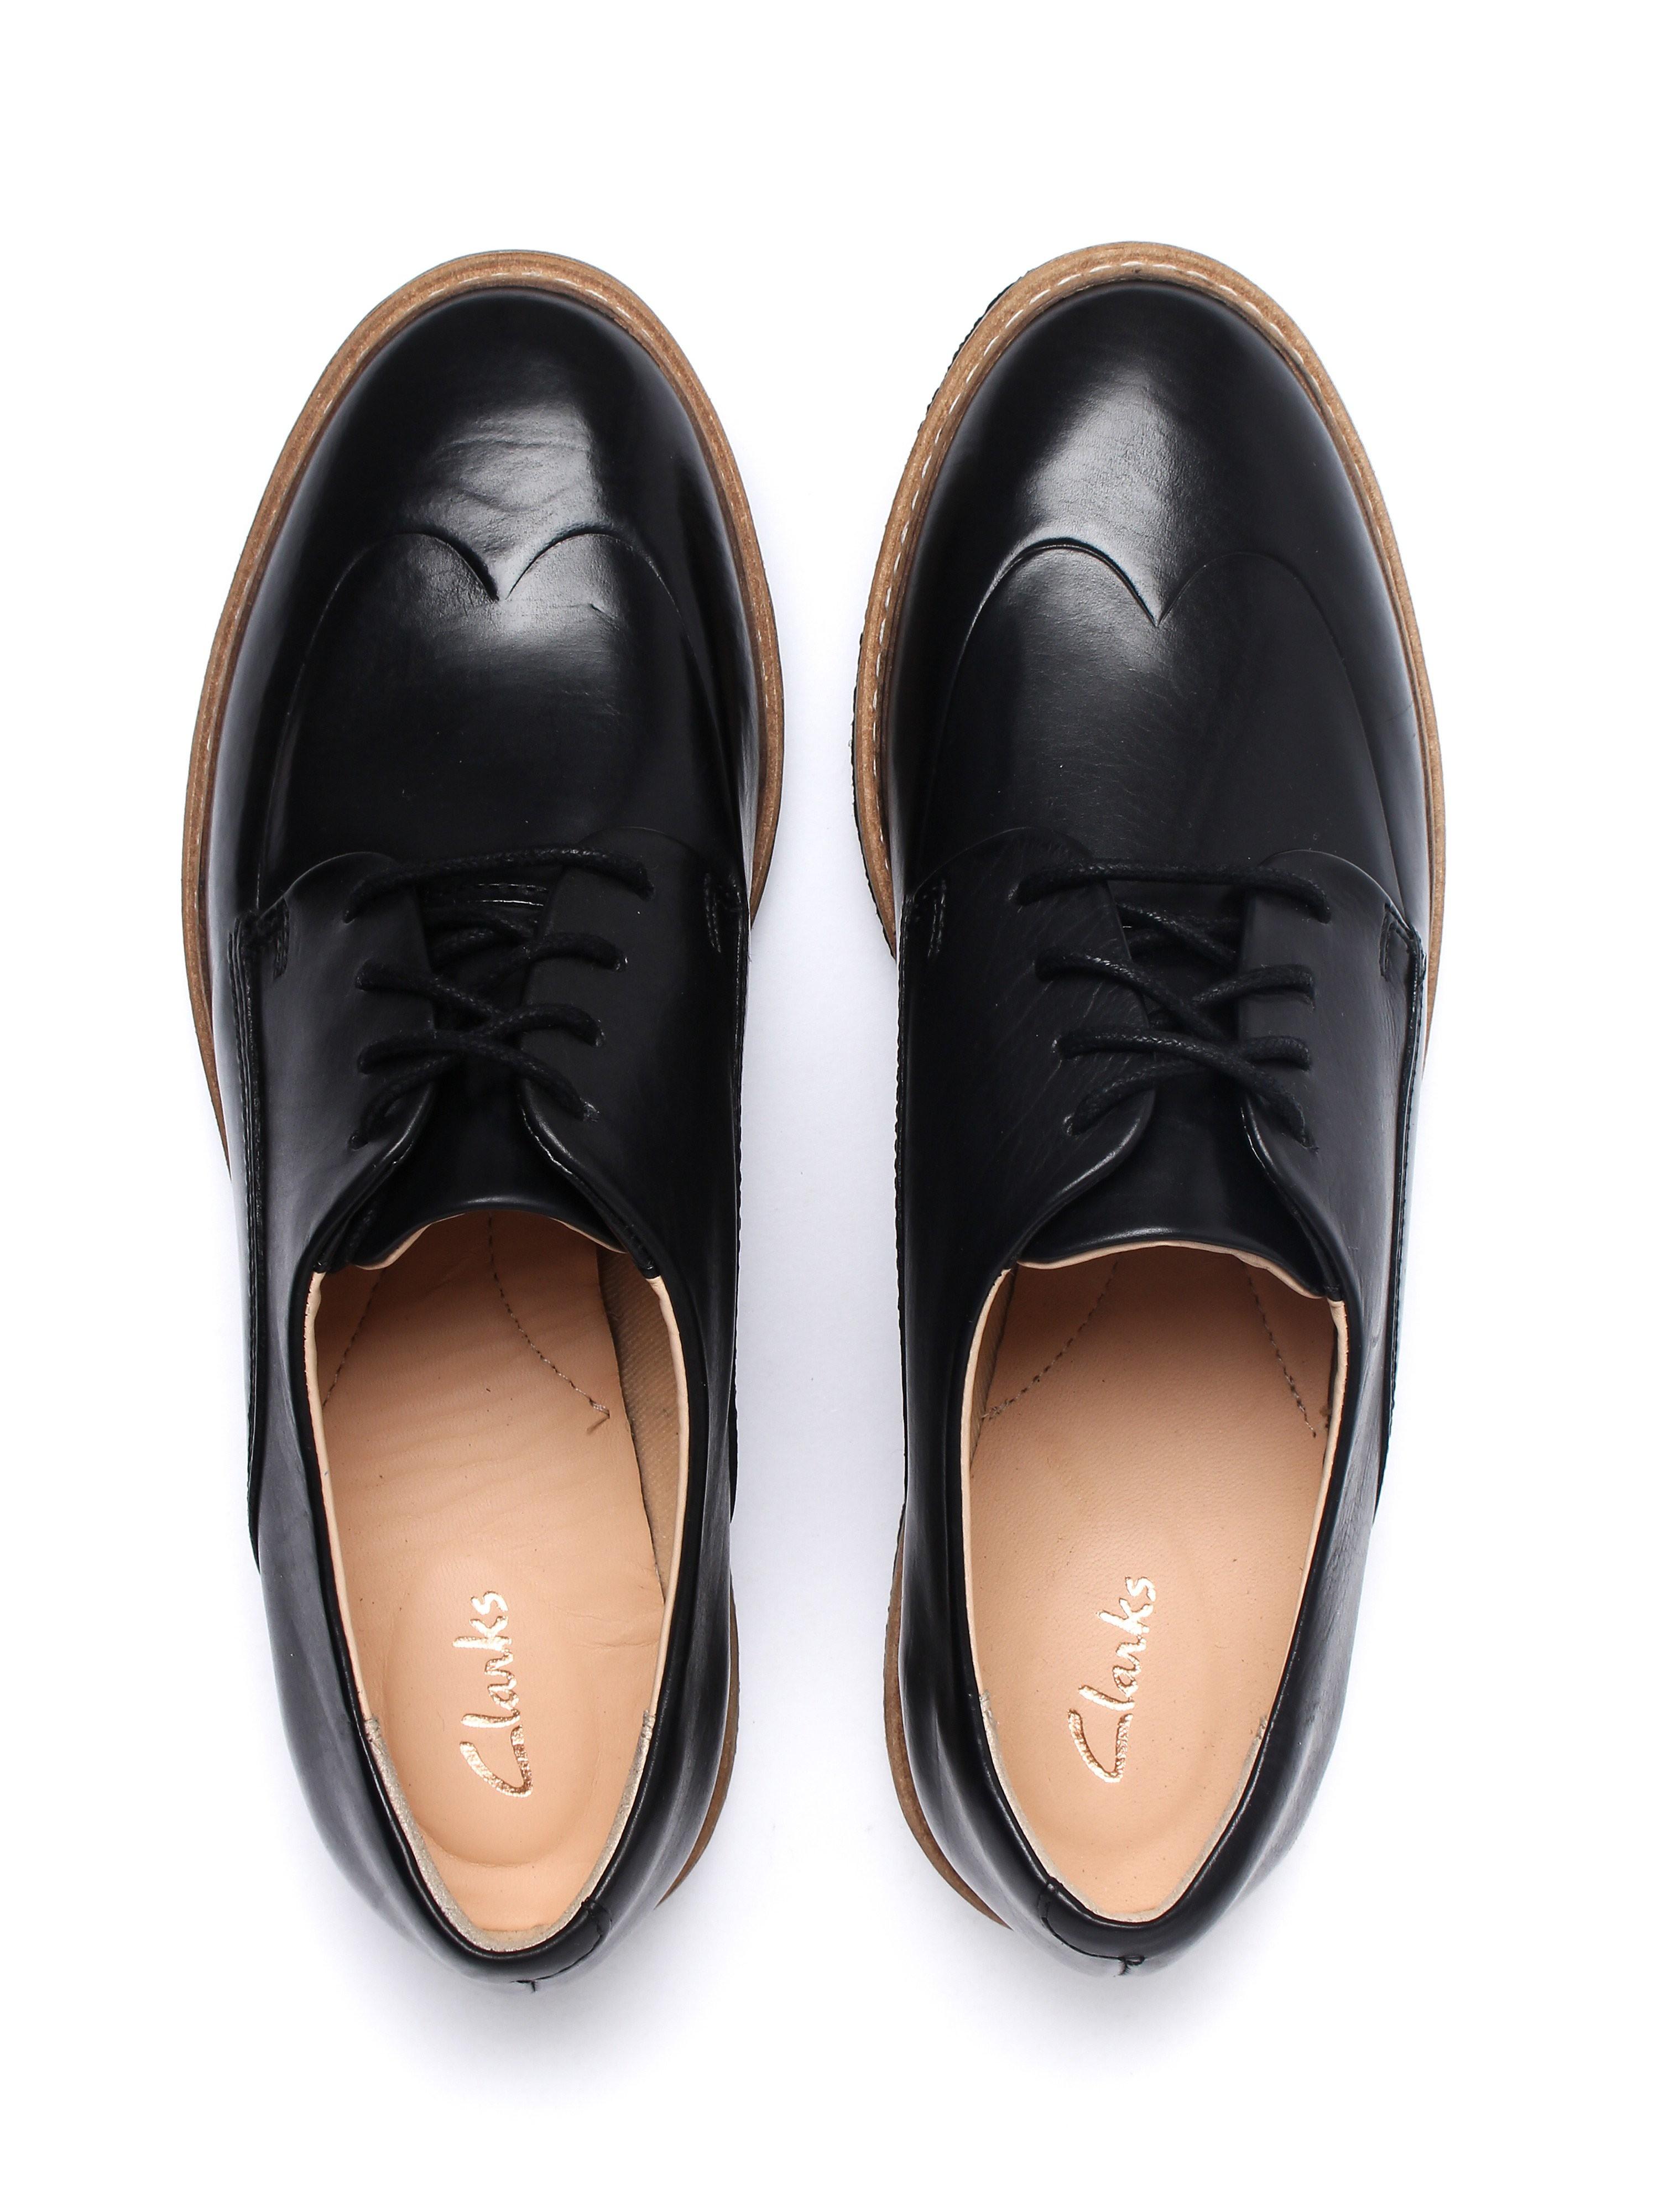 Clarks Women's Zante Zara  Brogues - Black Leather